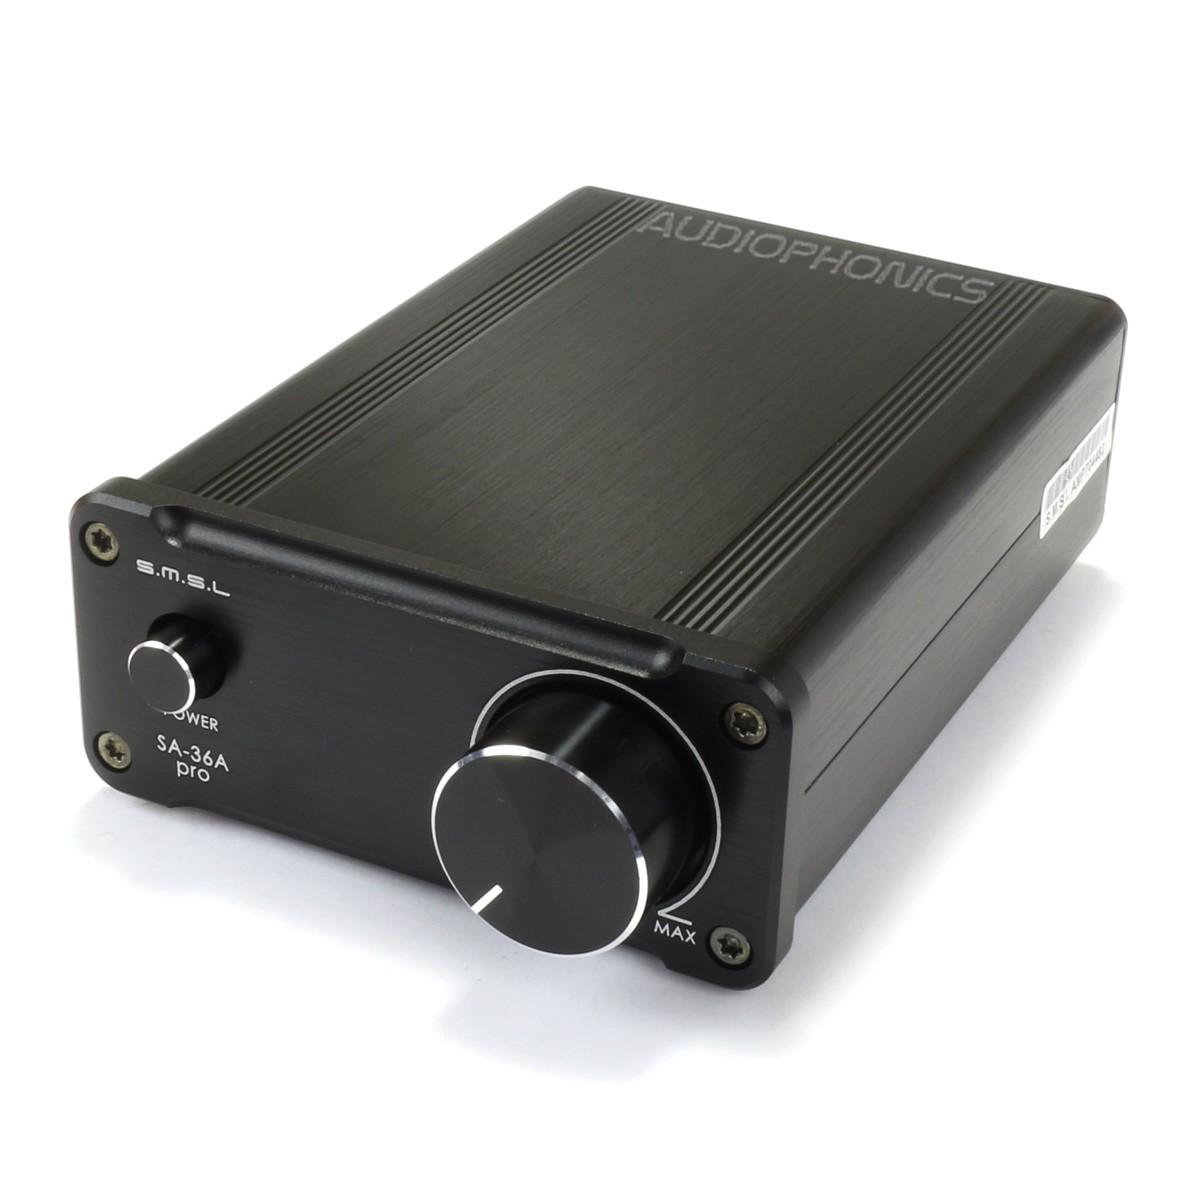 SMSL SA-36A Pro Digital Amplifier TDA7492PE Class D 2x 20W / 8 Ohm